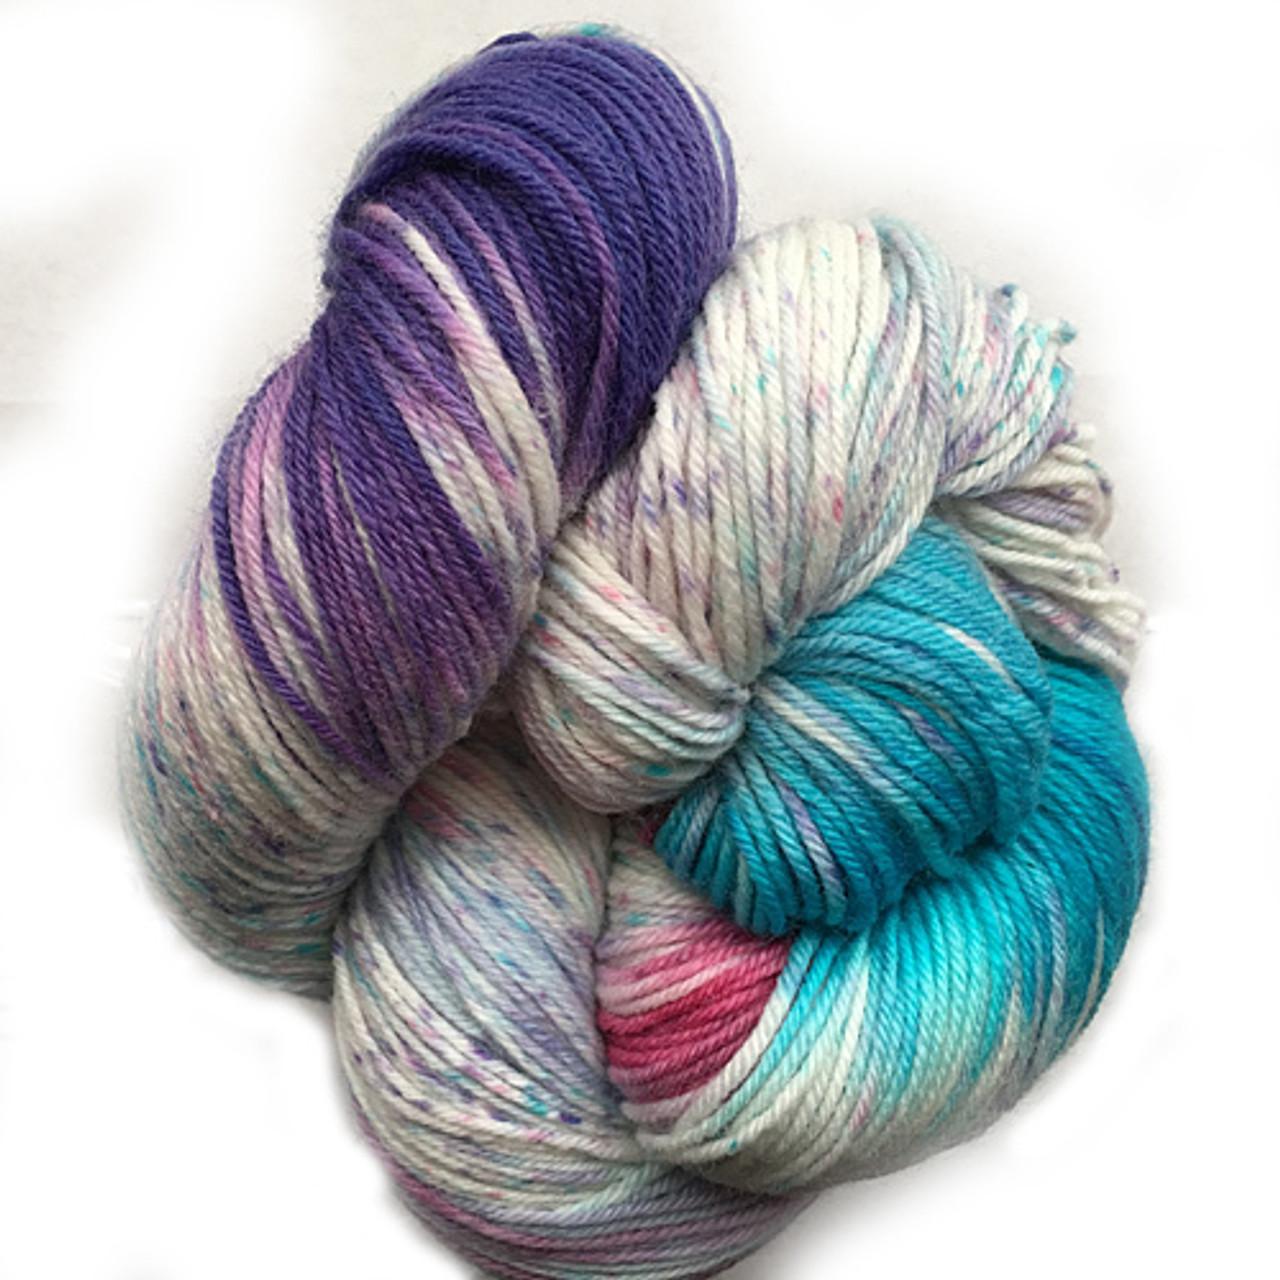 Araucania Huasco Sock at Angelika's Yarn Store